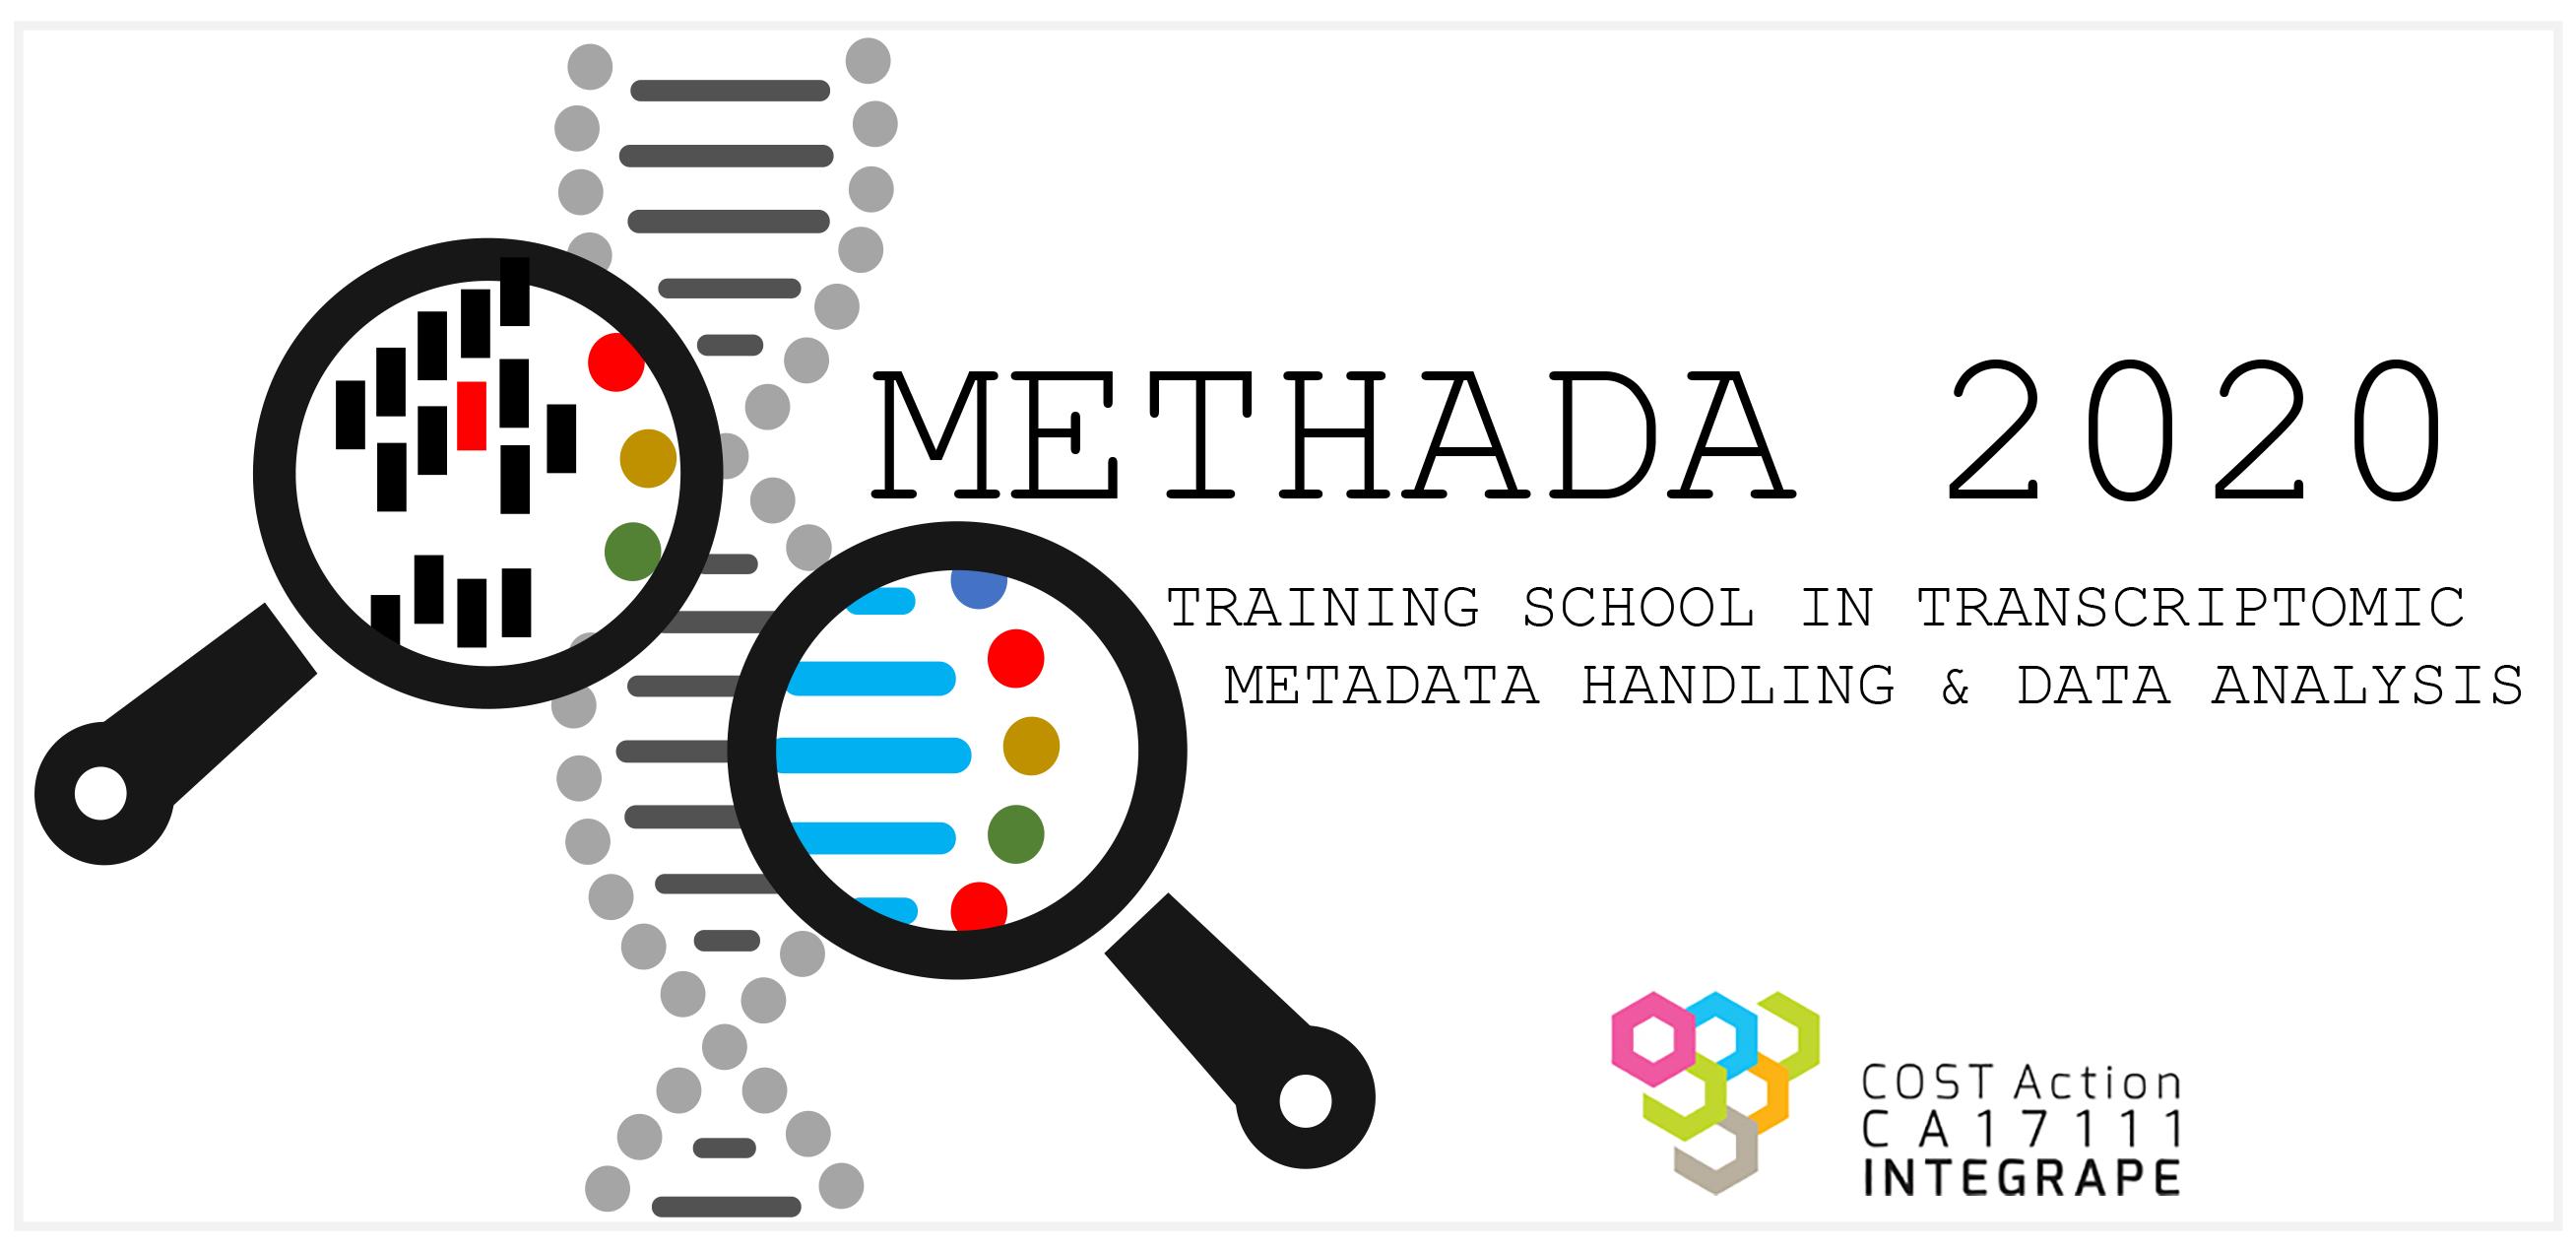 METHADA 2020